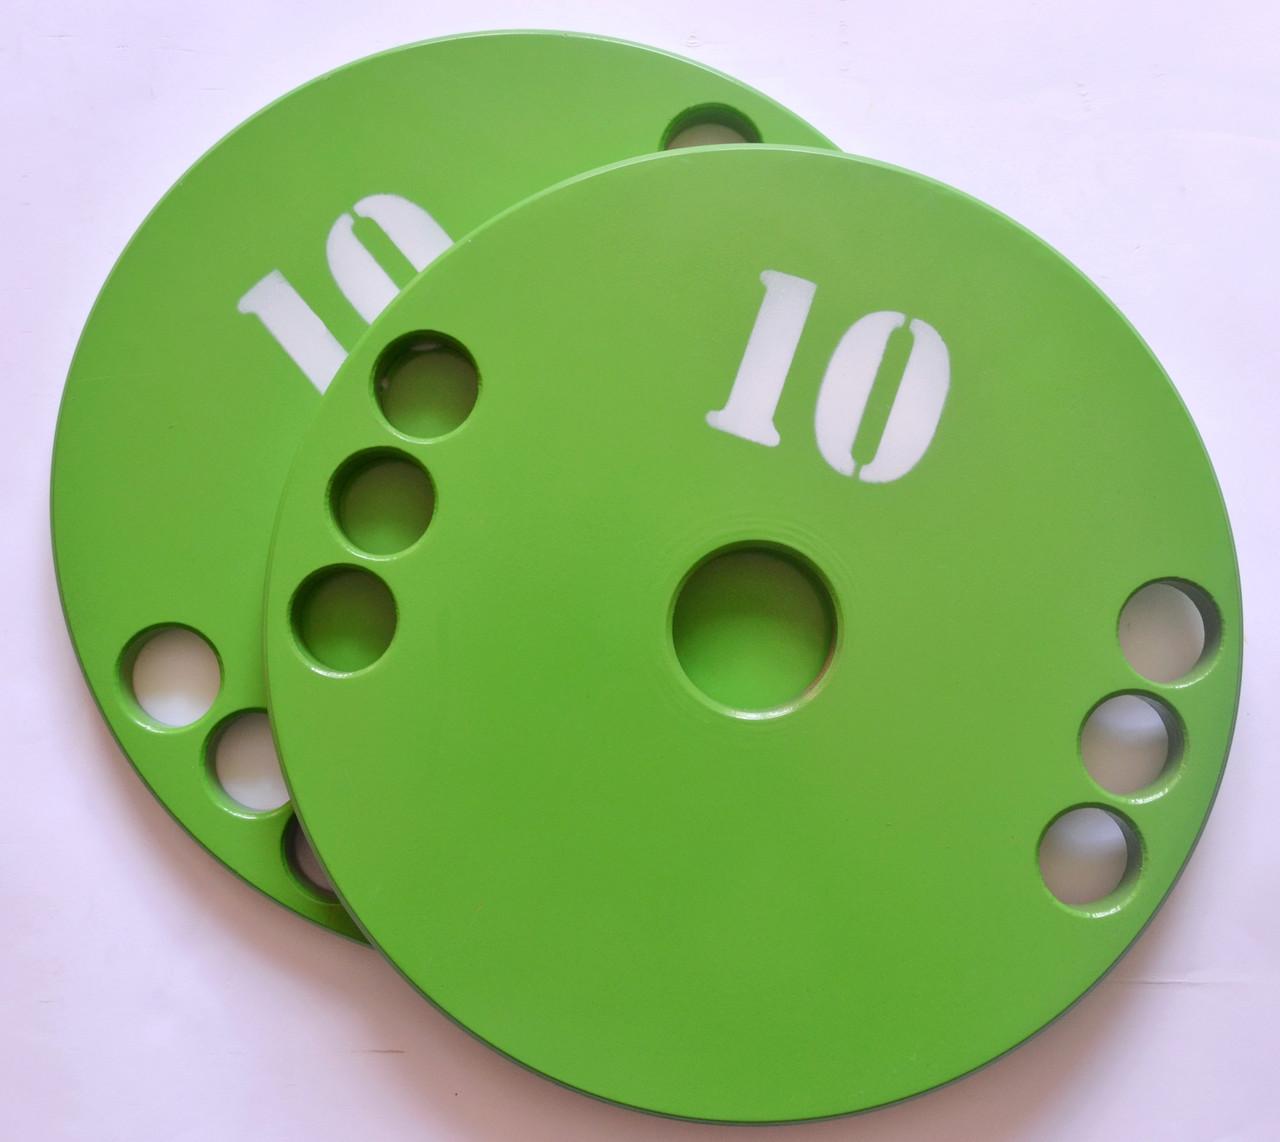 Диск олимпийский металлический 10 кг